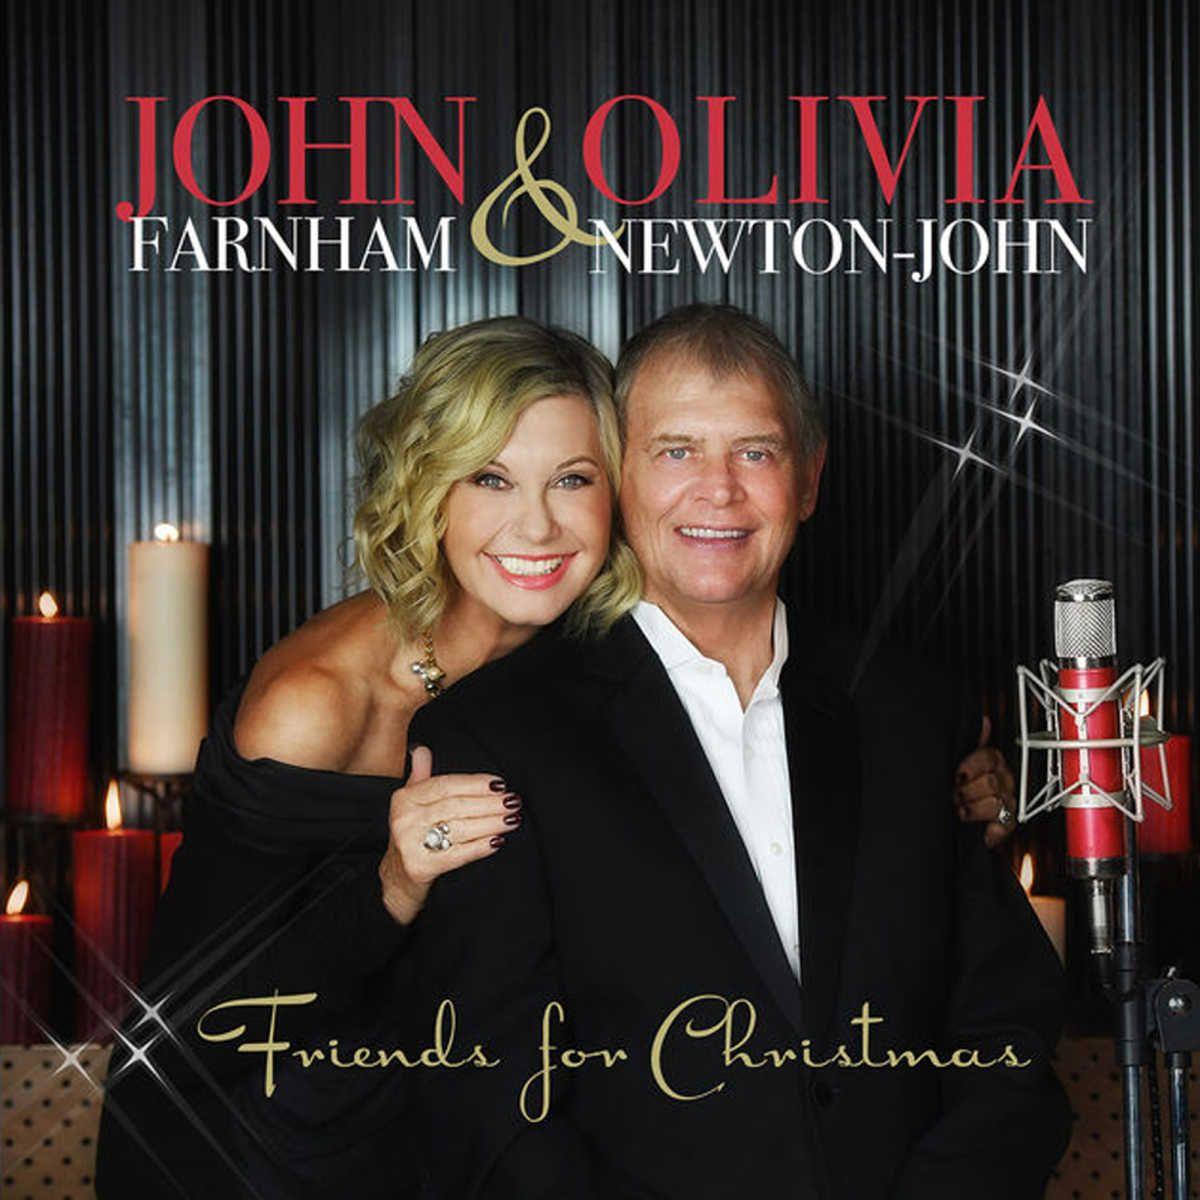 John Farnham - Friends For Christmas album cover